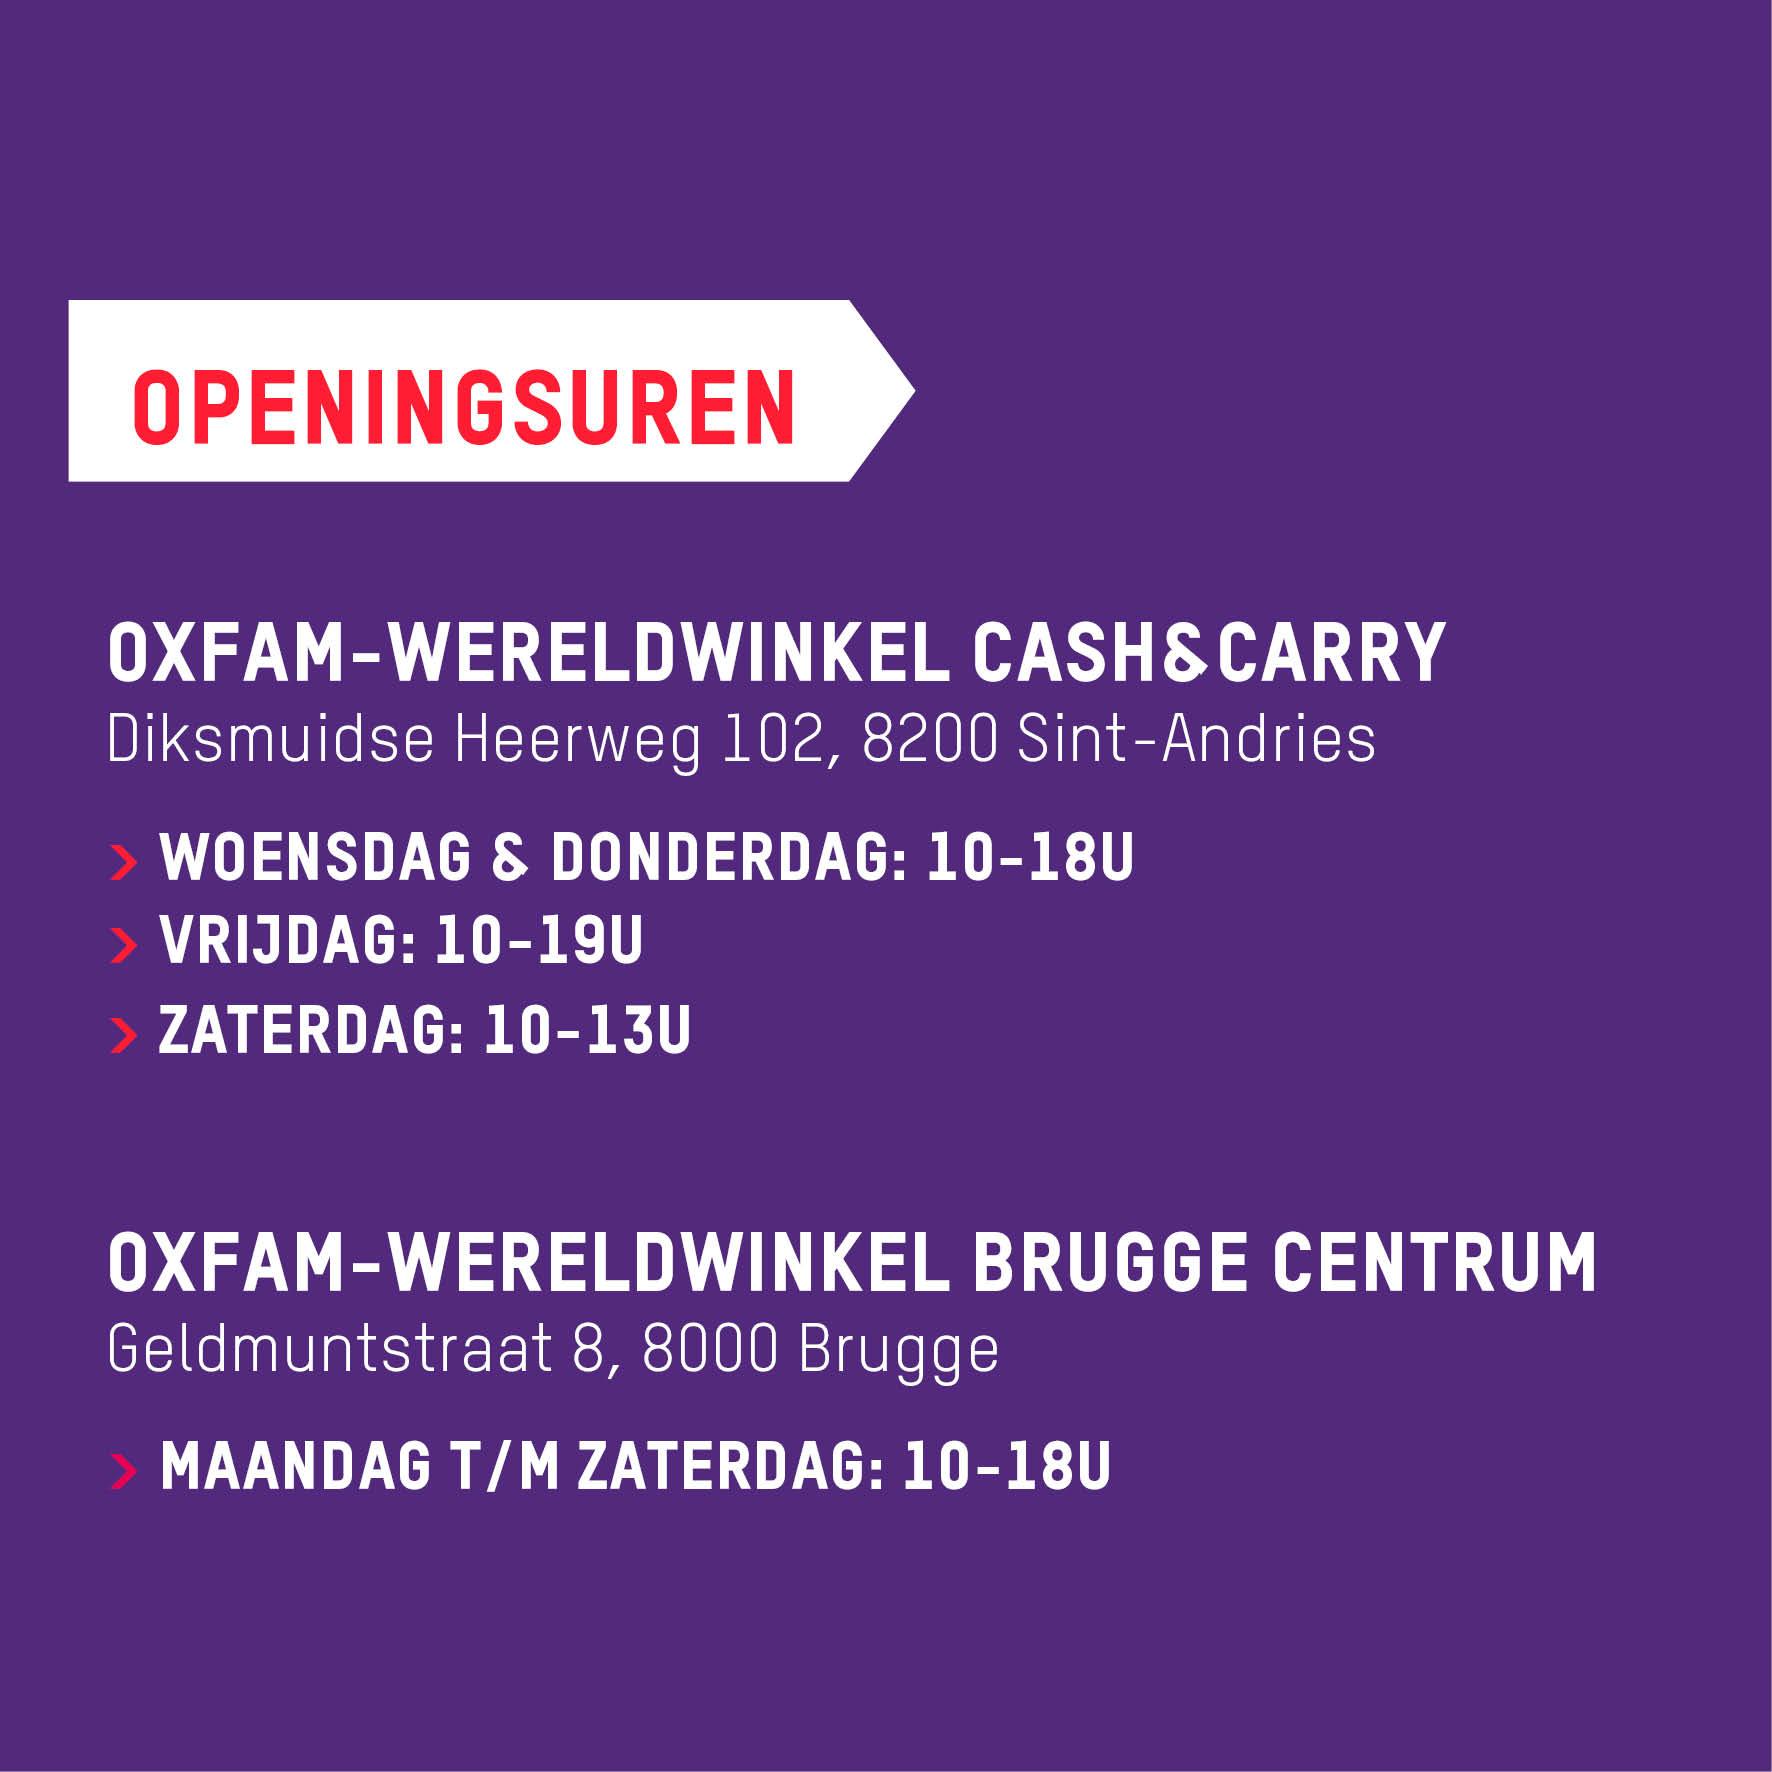 Openingsuren Brugge